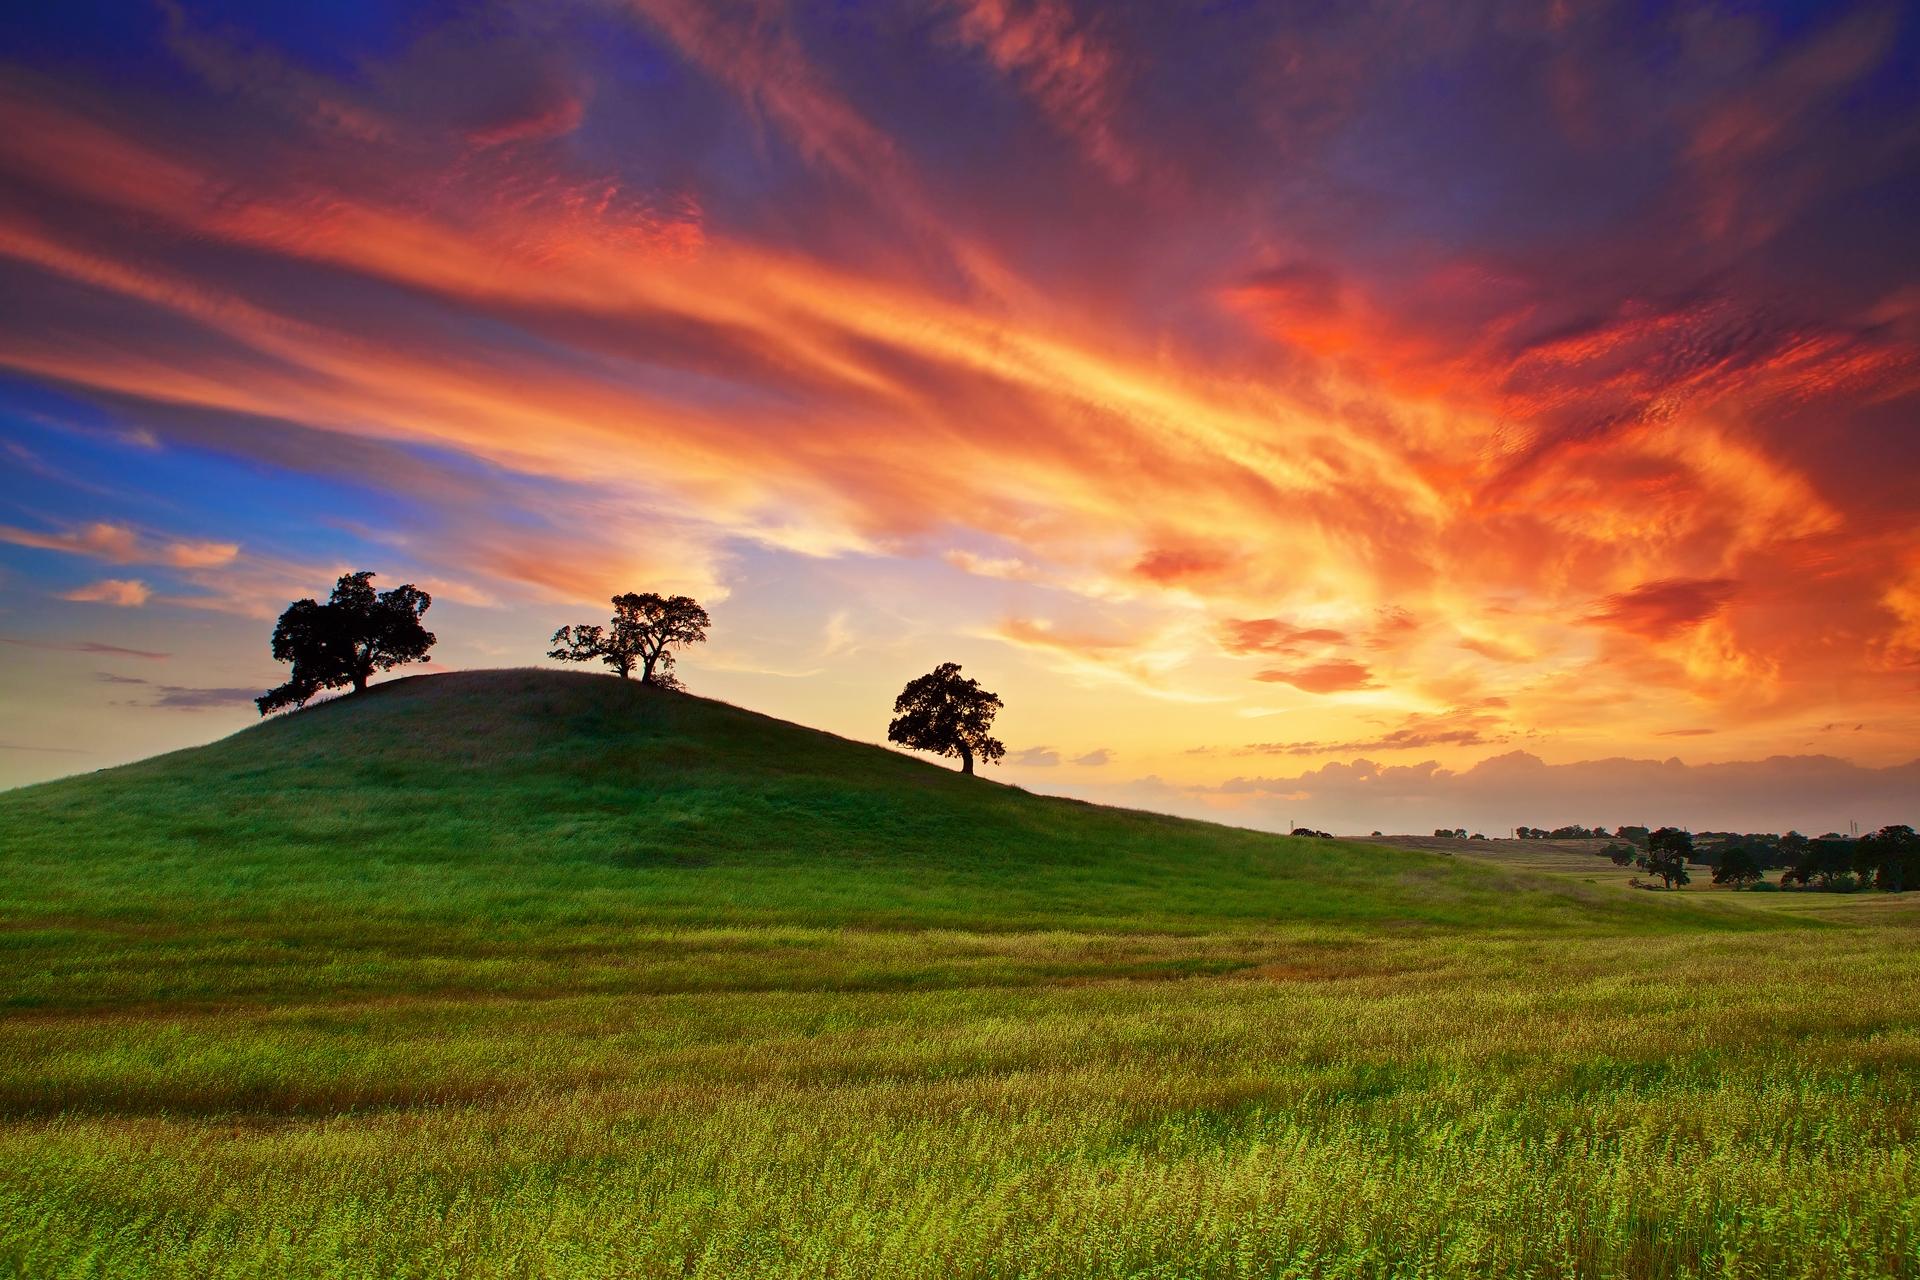 Wallpaper : sunlight, trees, landscape, sunset, hill ...